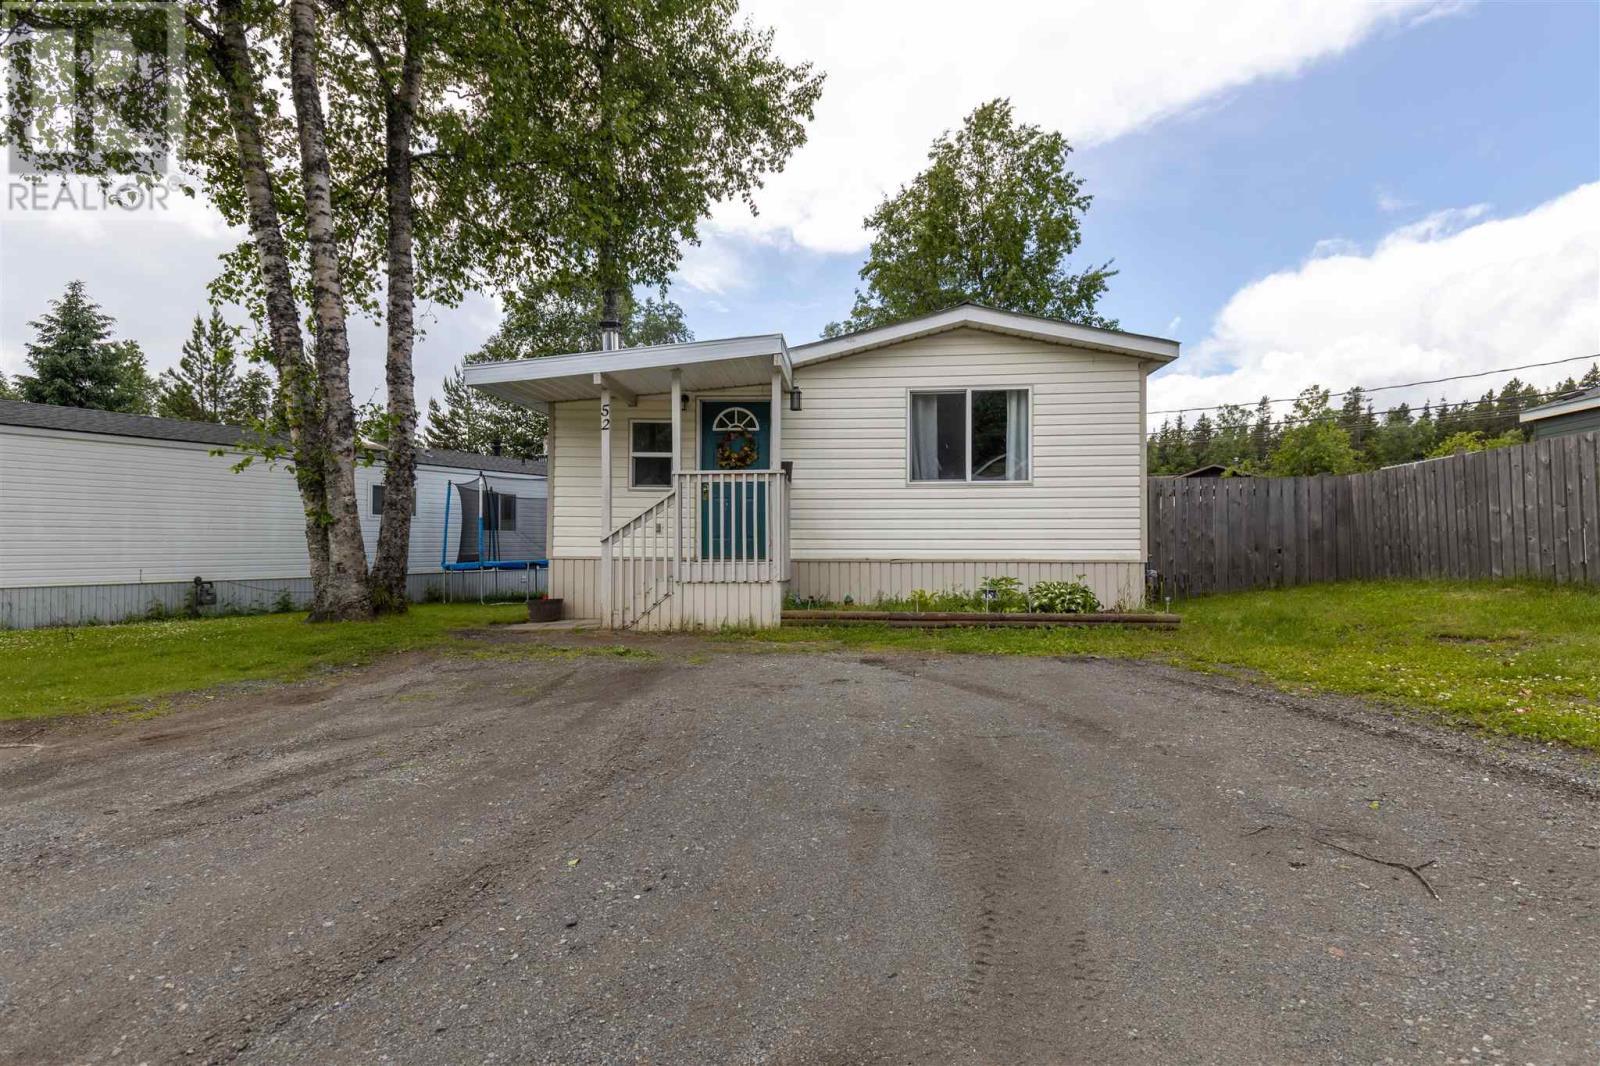 52 3616 Larch Avenue, Terrace, British Columbia  V8G 5B9 - Photo 1 - R2594554